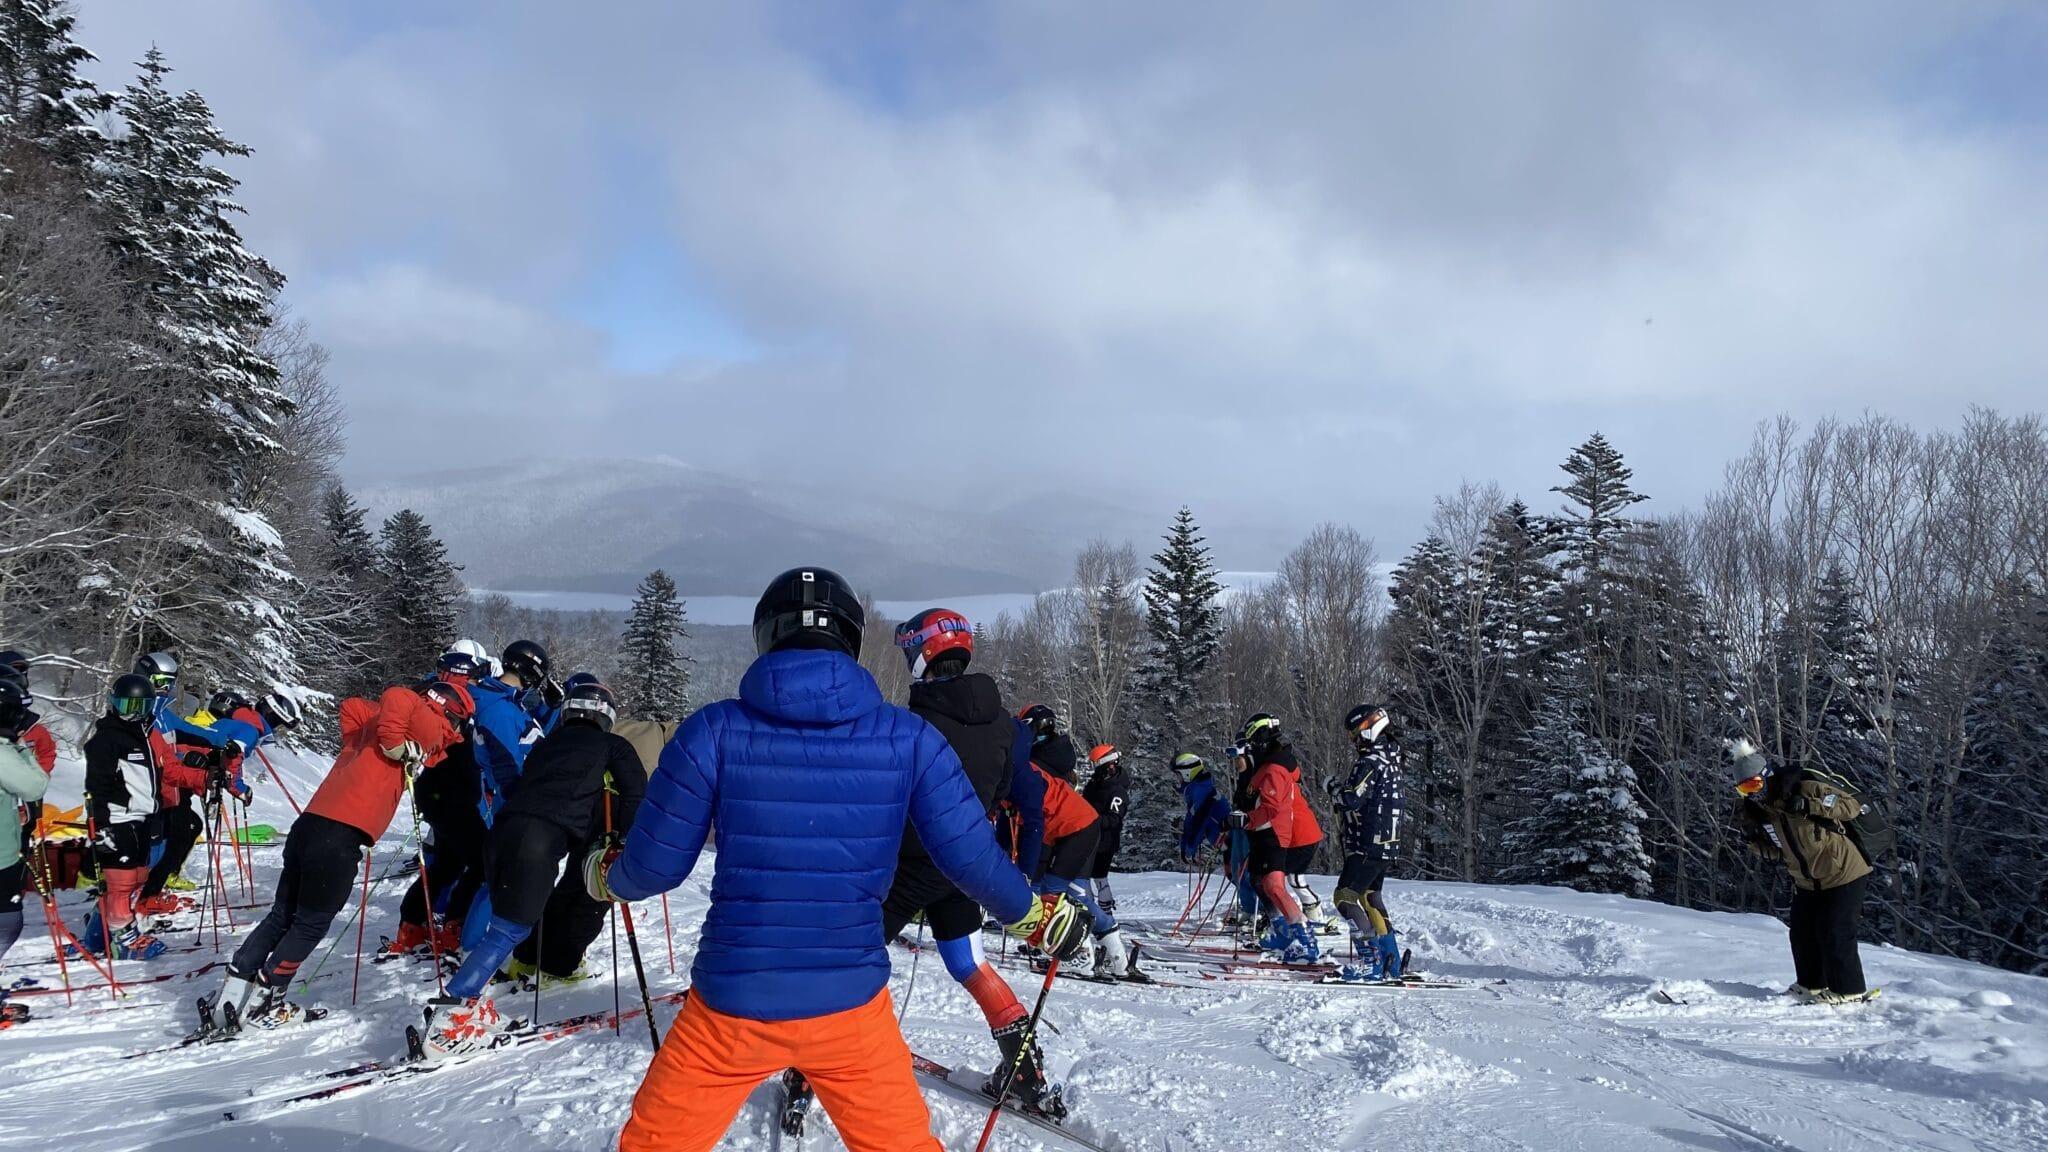 日本体育大学スキー部@阿寒